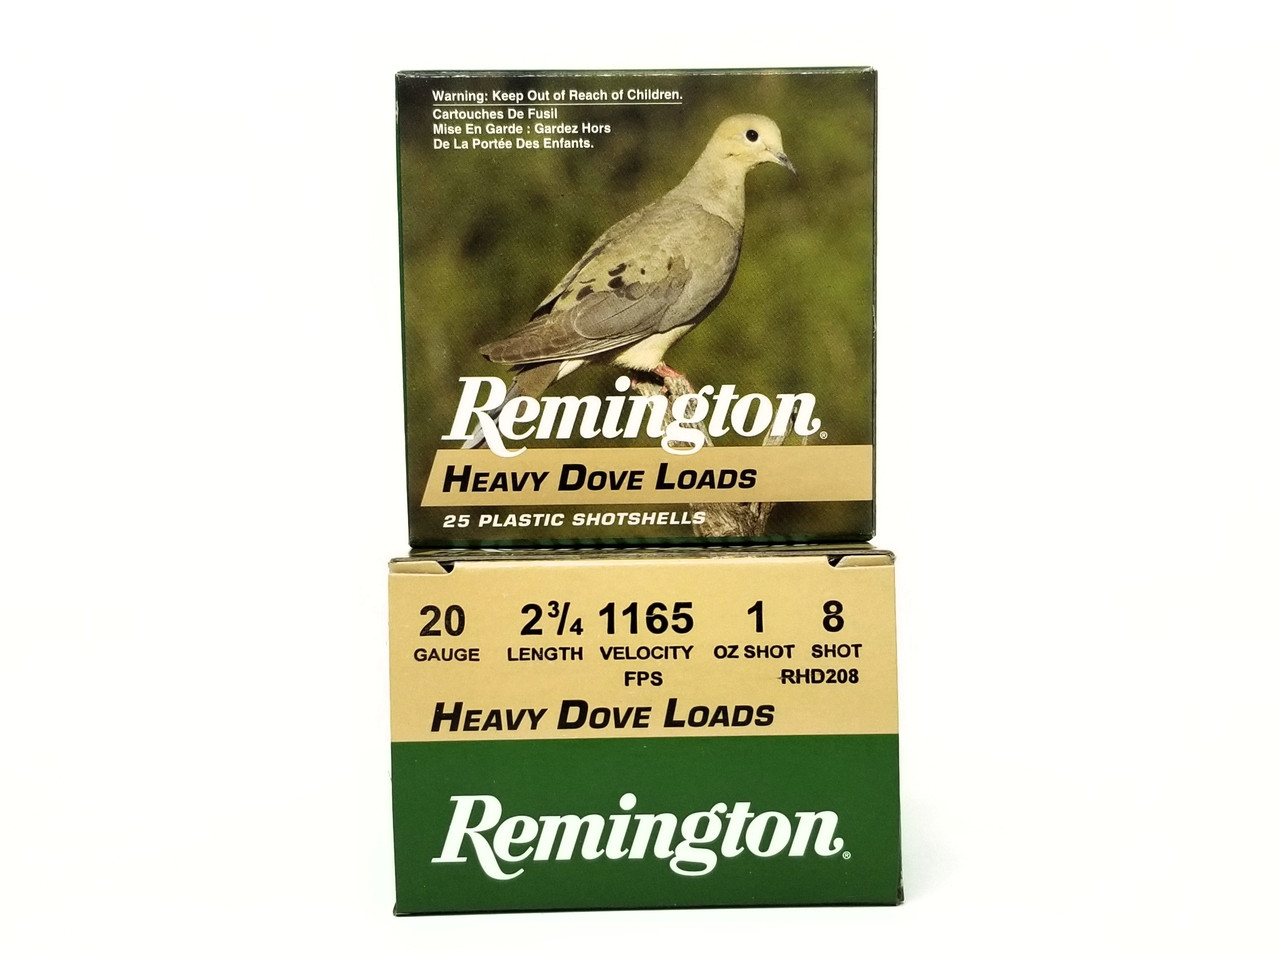 Extruded 0.375 Diameter Remington Industries 0.375X2.0FLT6061T6511-48 3//8 x 2 Aluminum Flat Bar 48 Length 6061 General Purpose Plate T6511 Mill Stock